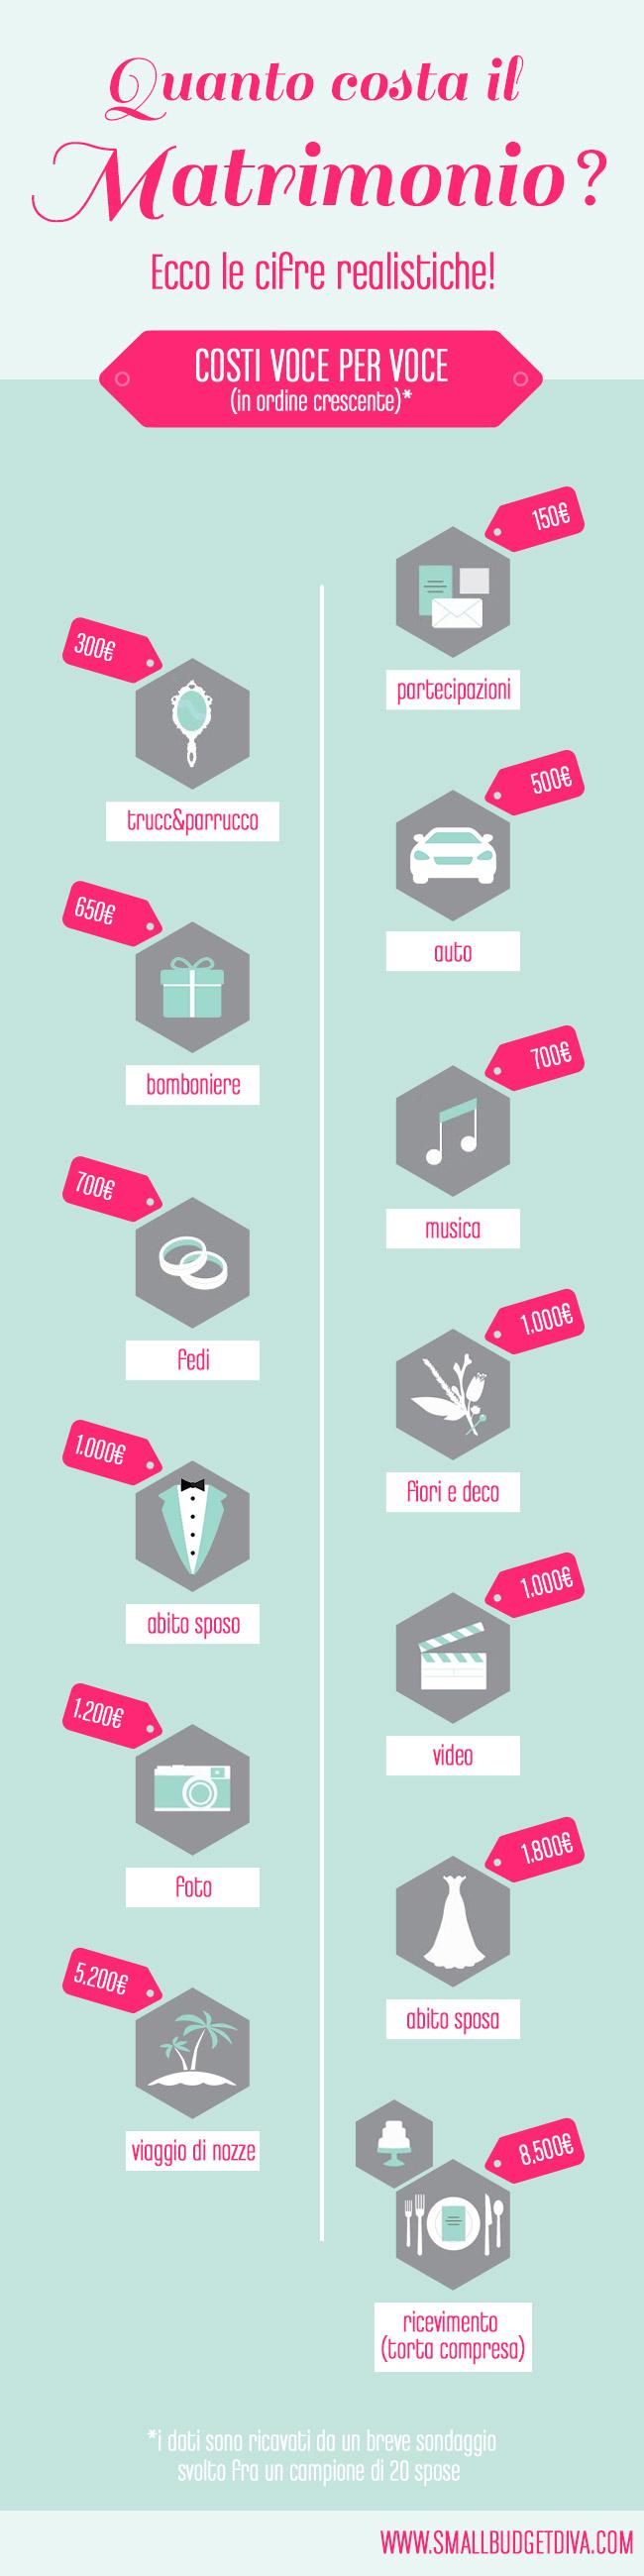 quanto-costa-un-matrimonio-secondo-noi